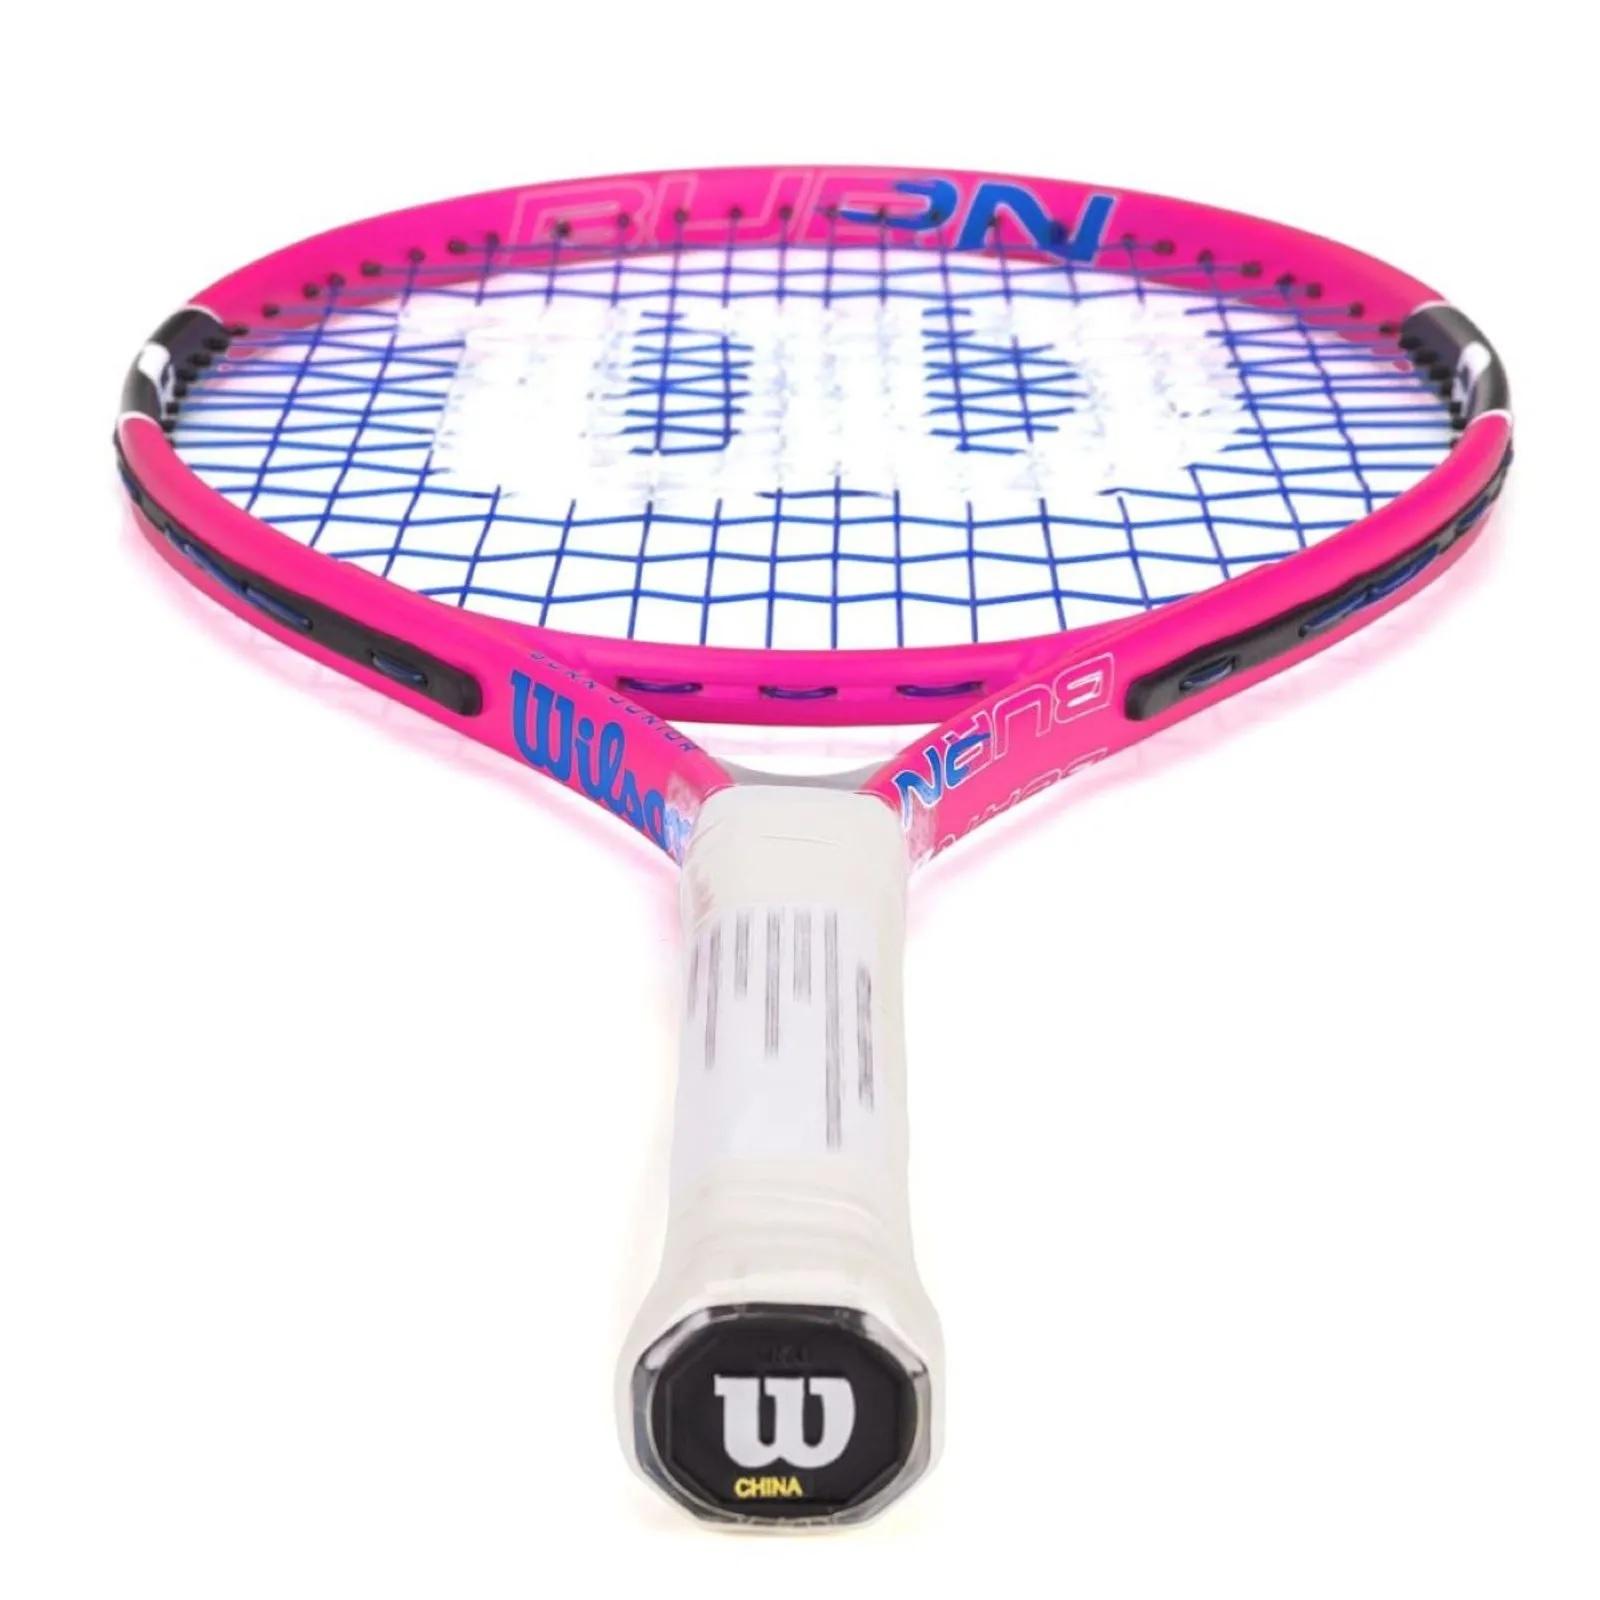 Raquete Tênis Wilson Burn 23 Pink Infantil